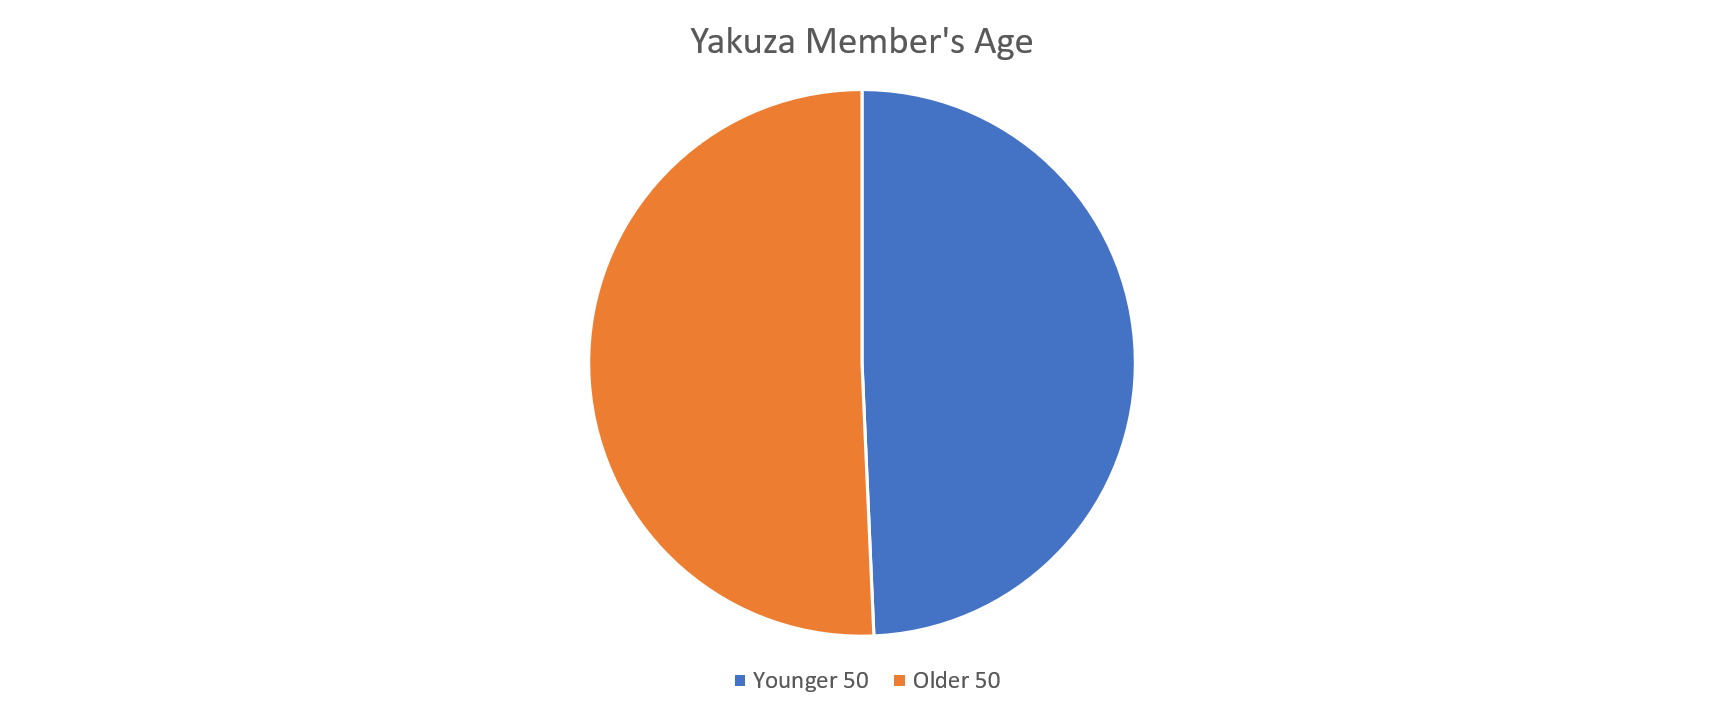 Yakuza Member's Age